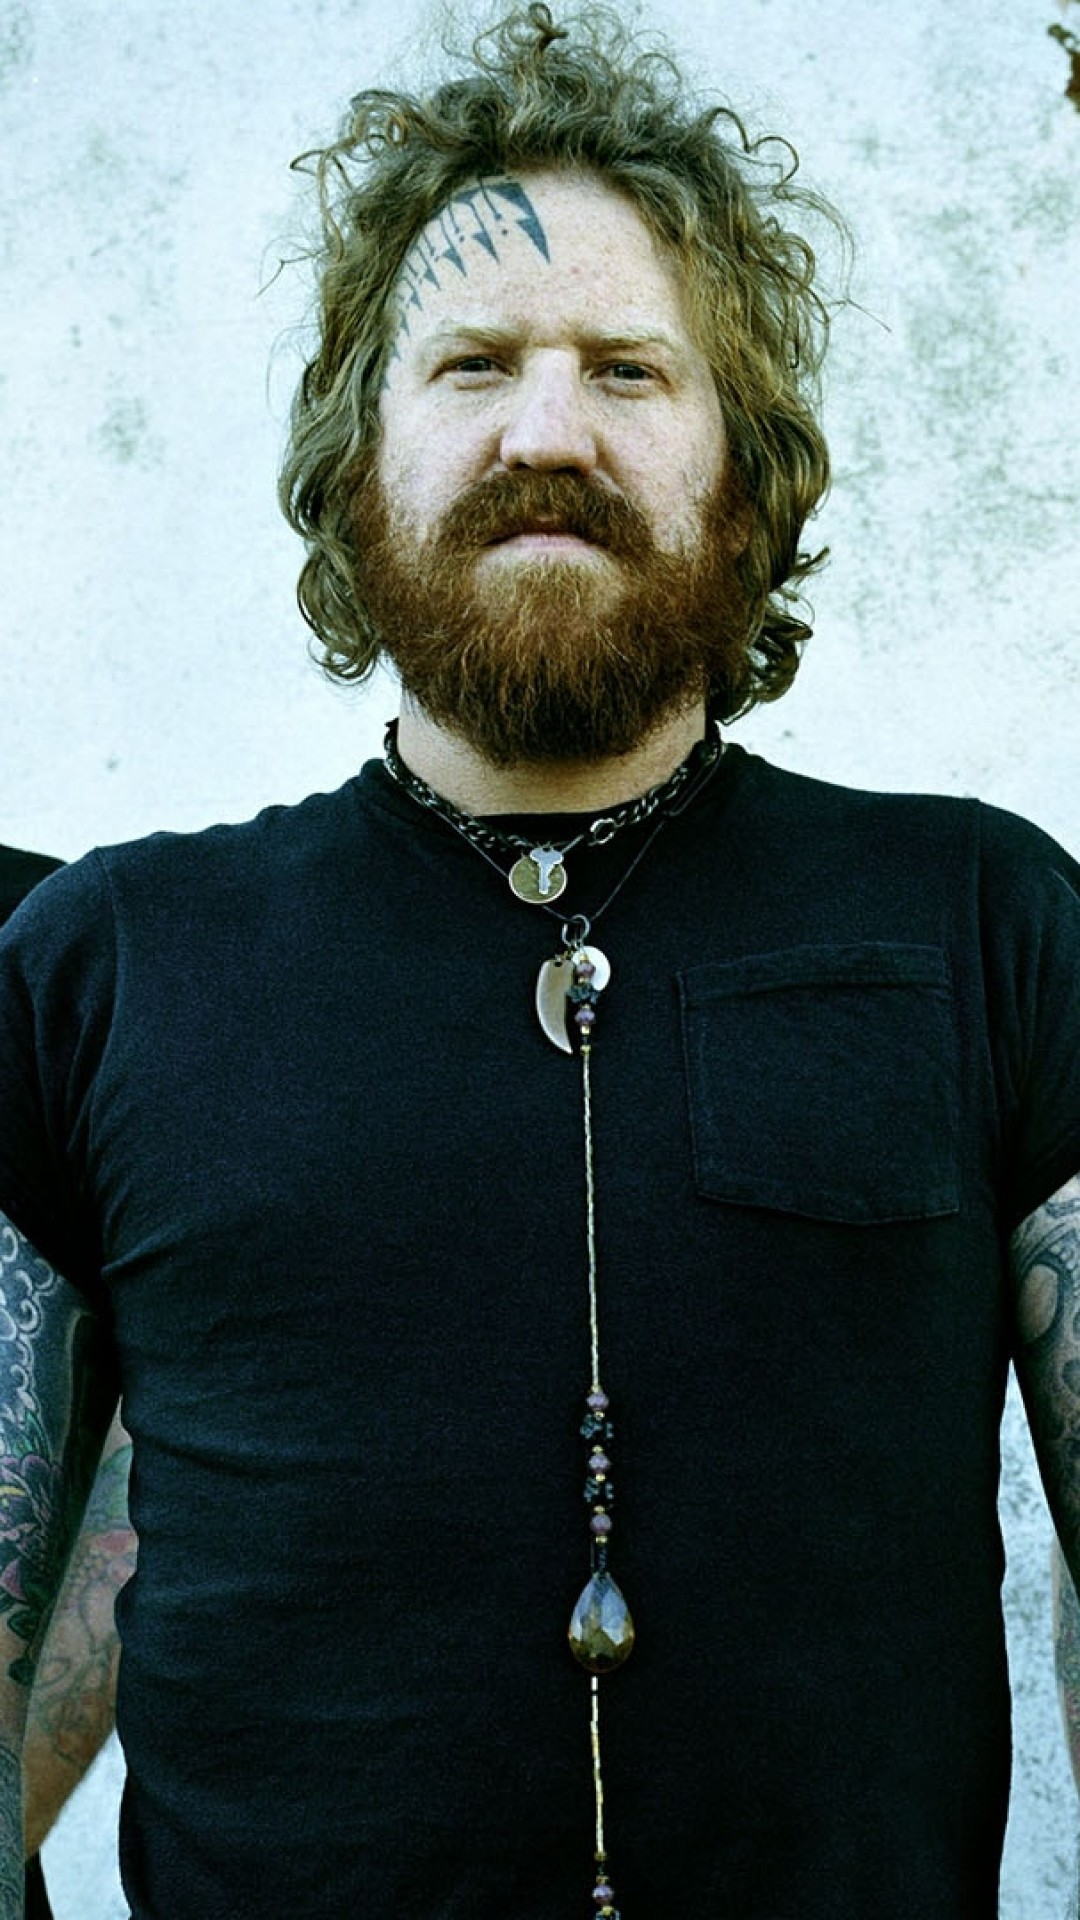 Wallpaper mastodon, earrings, t-shirts, chain, beard